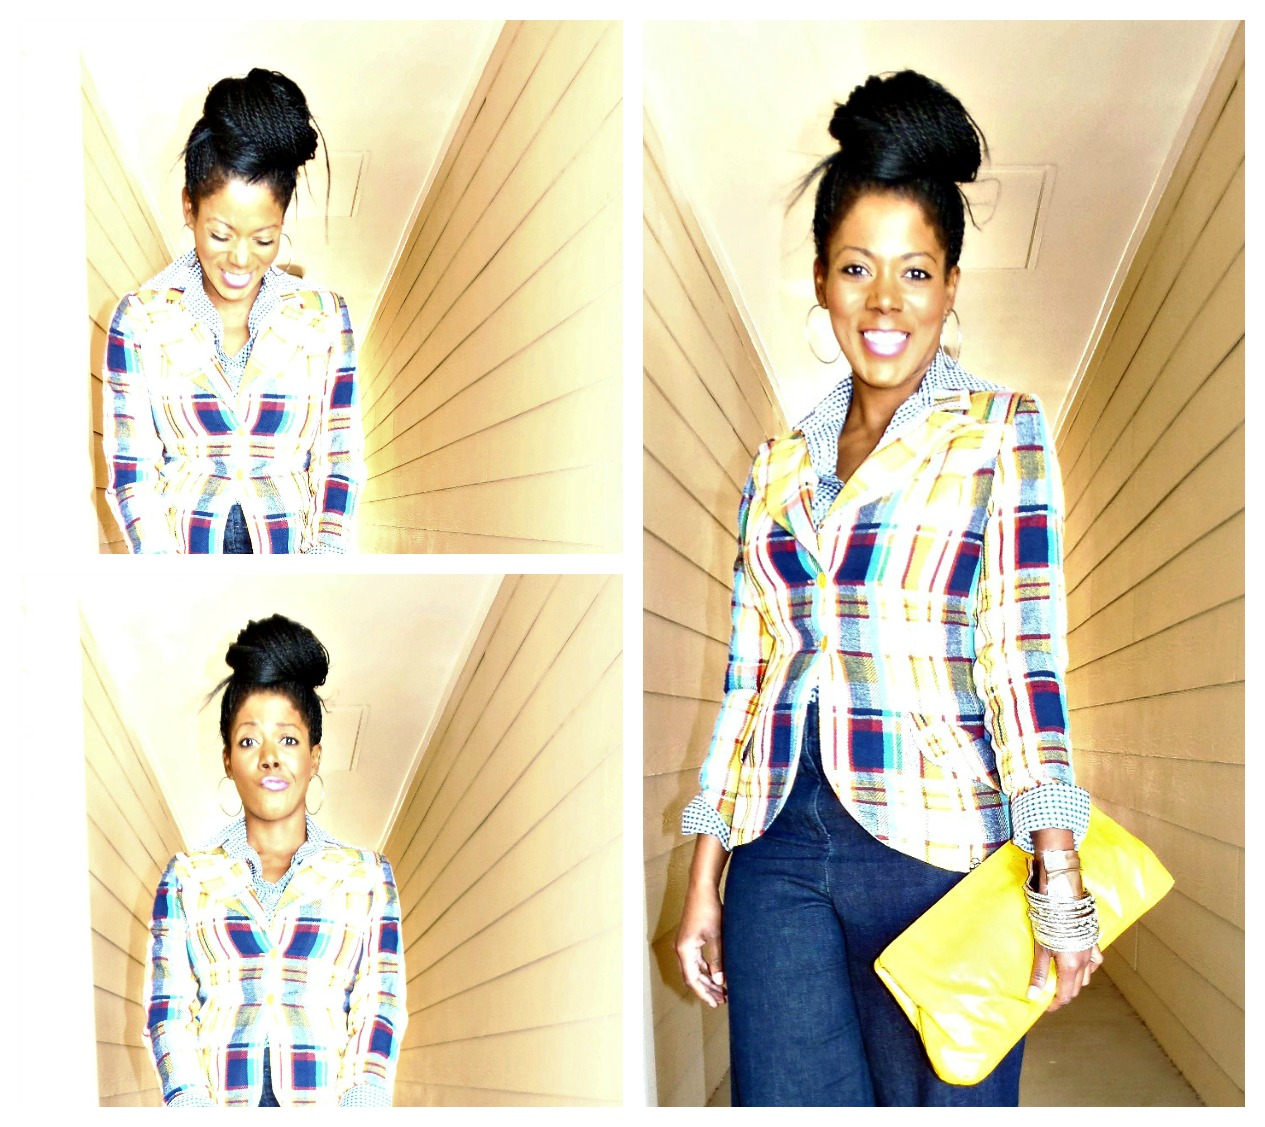 http://2.bp.blogspot.com/-gpuz4xbv8xQ/USE7cH4bWzI/AAAAAAAAMUI/rDc7hMA30dw/s1600/2.17.4+PicMonkey+Collage.jpg